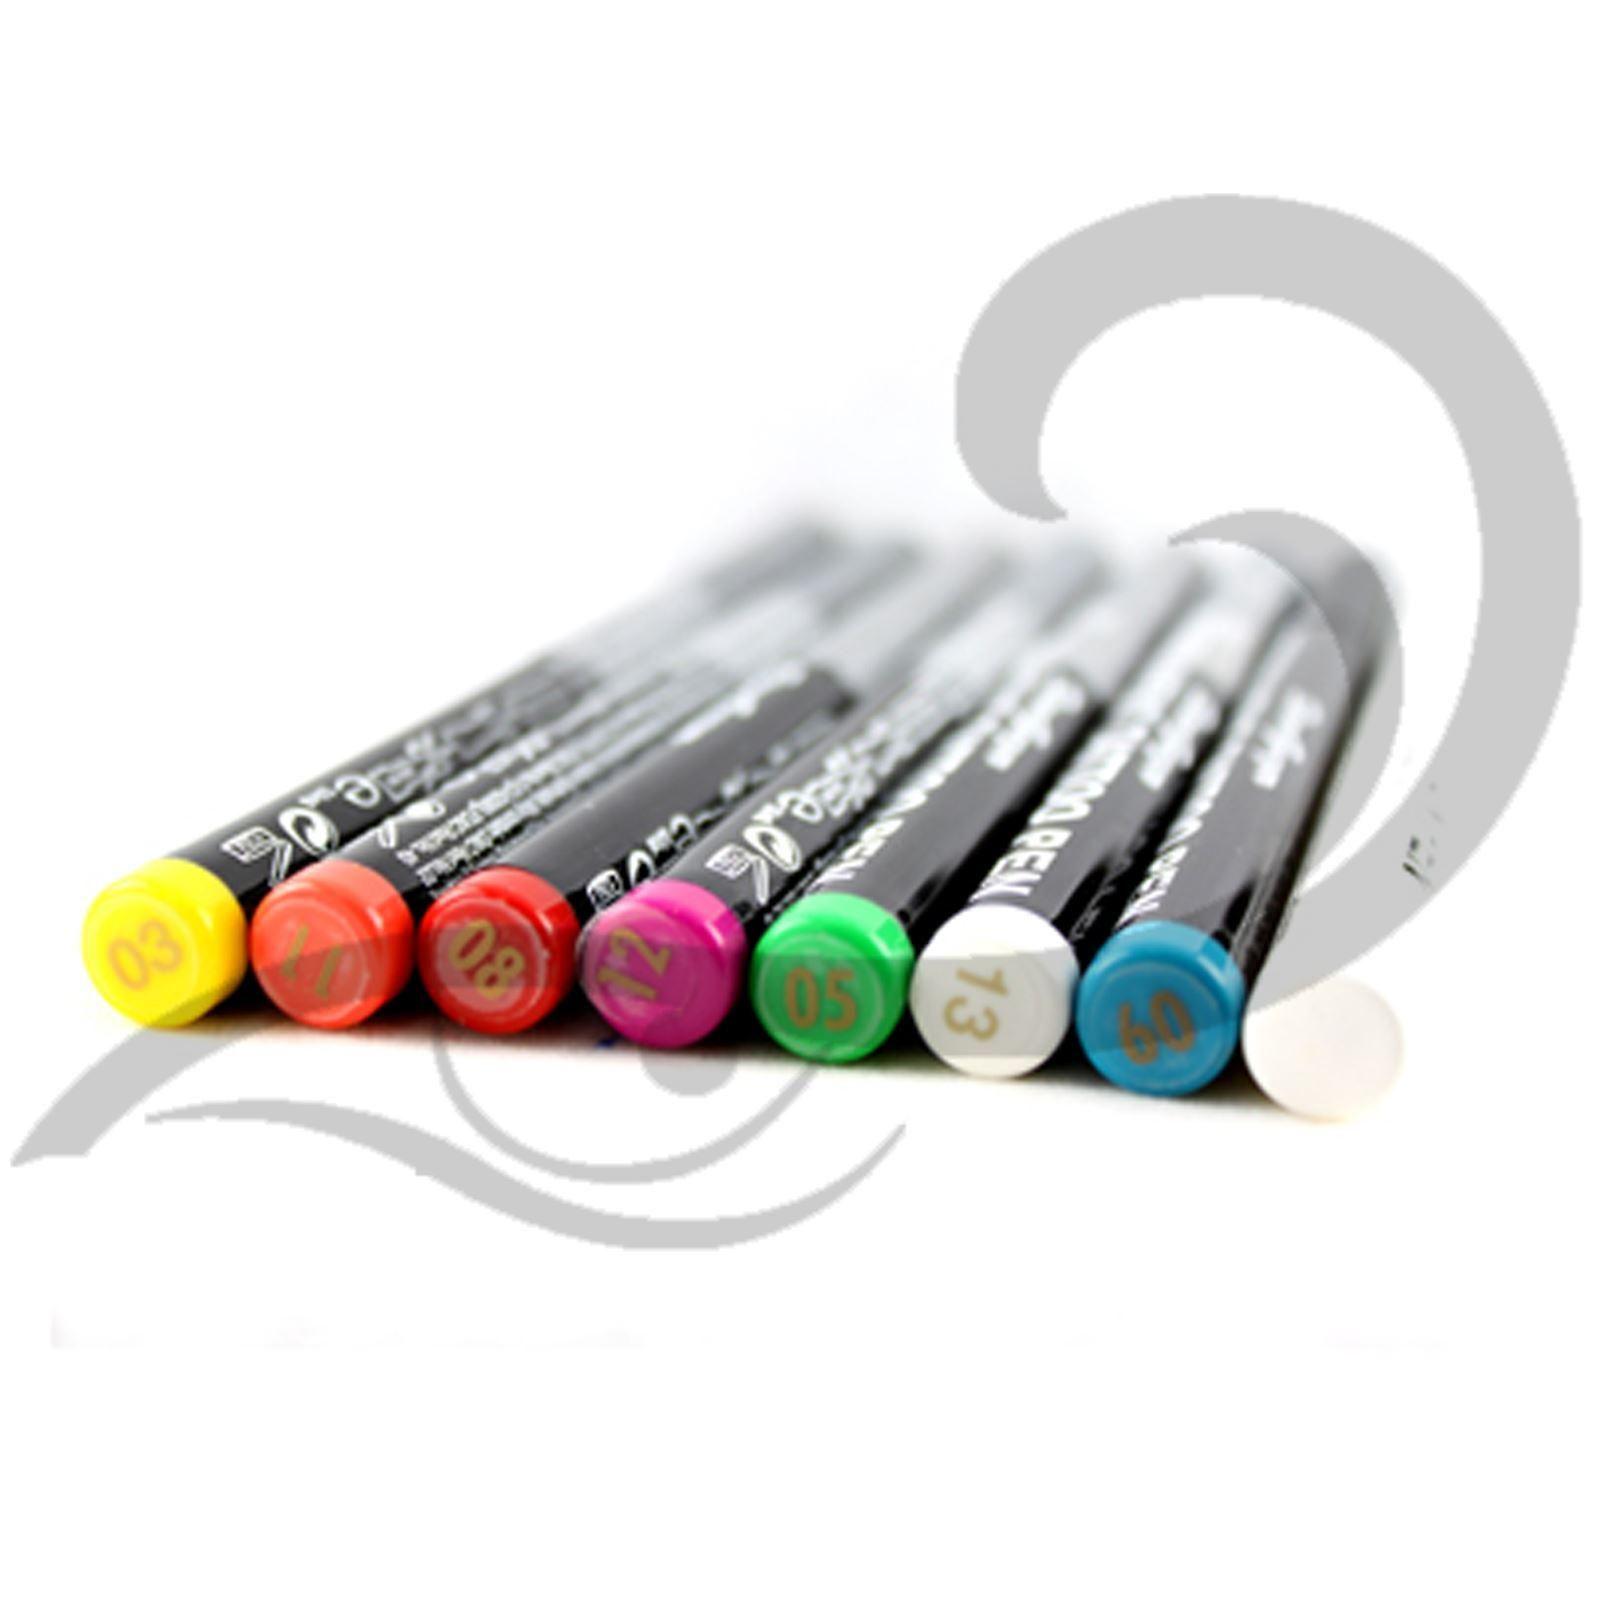 Stargazer Tattoo Pen - Black